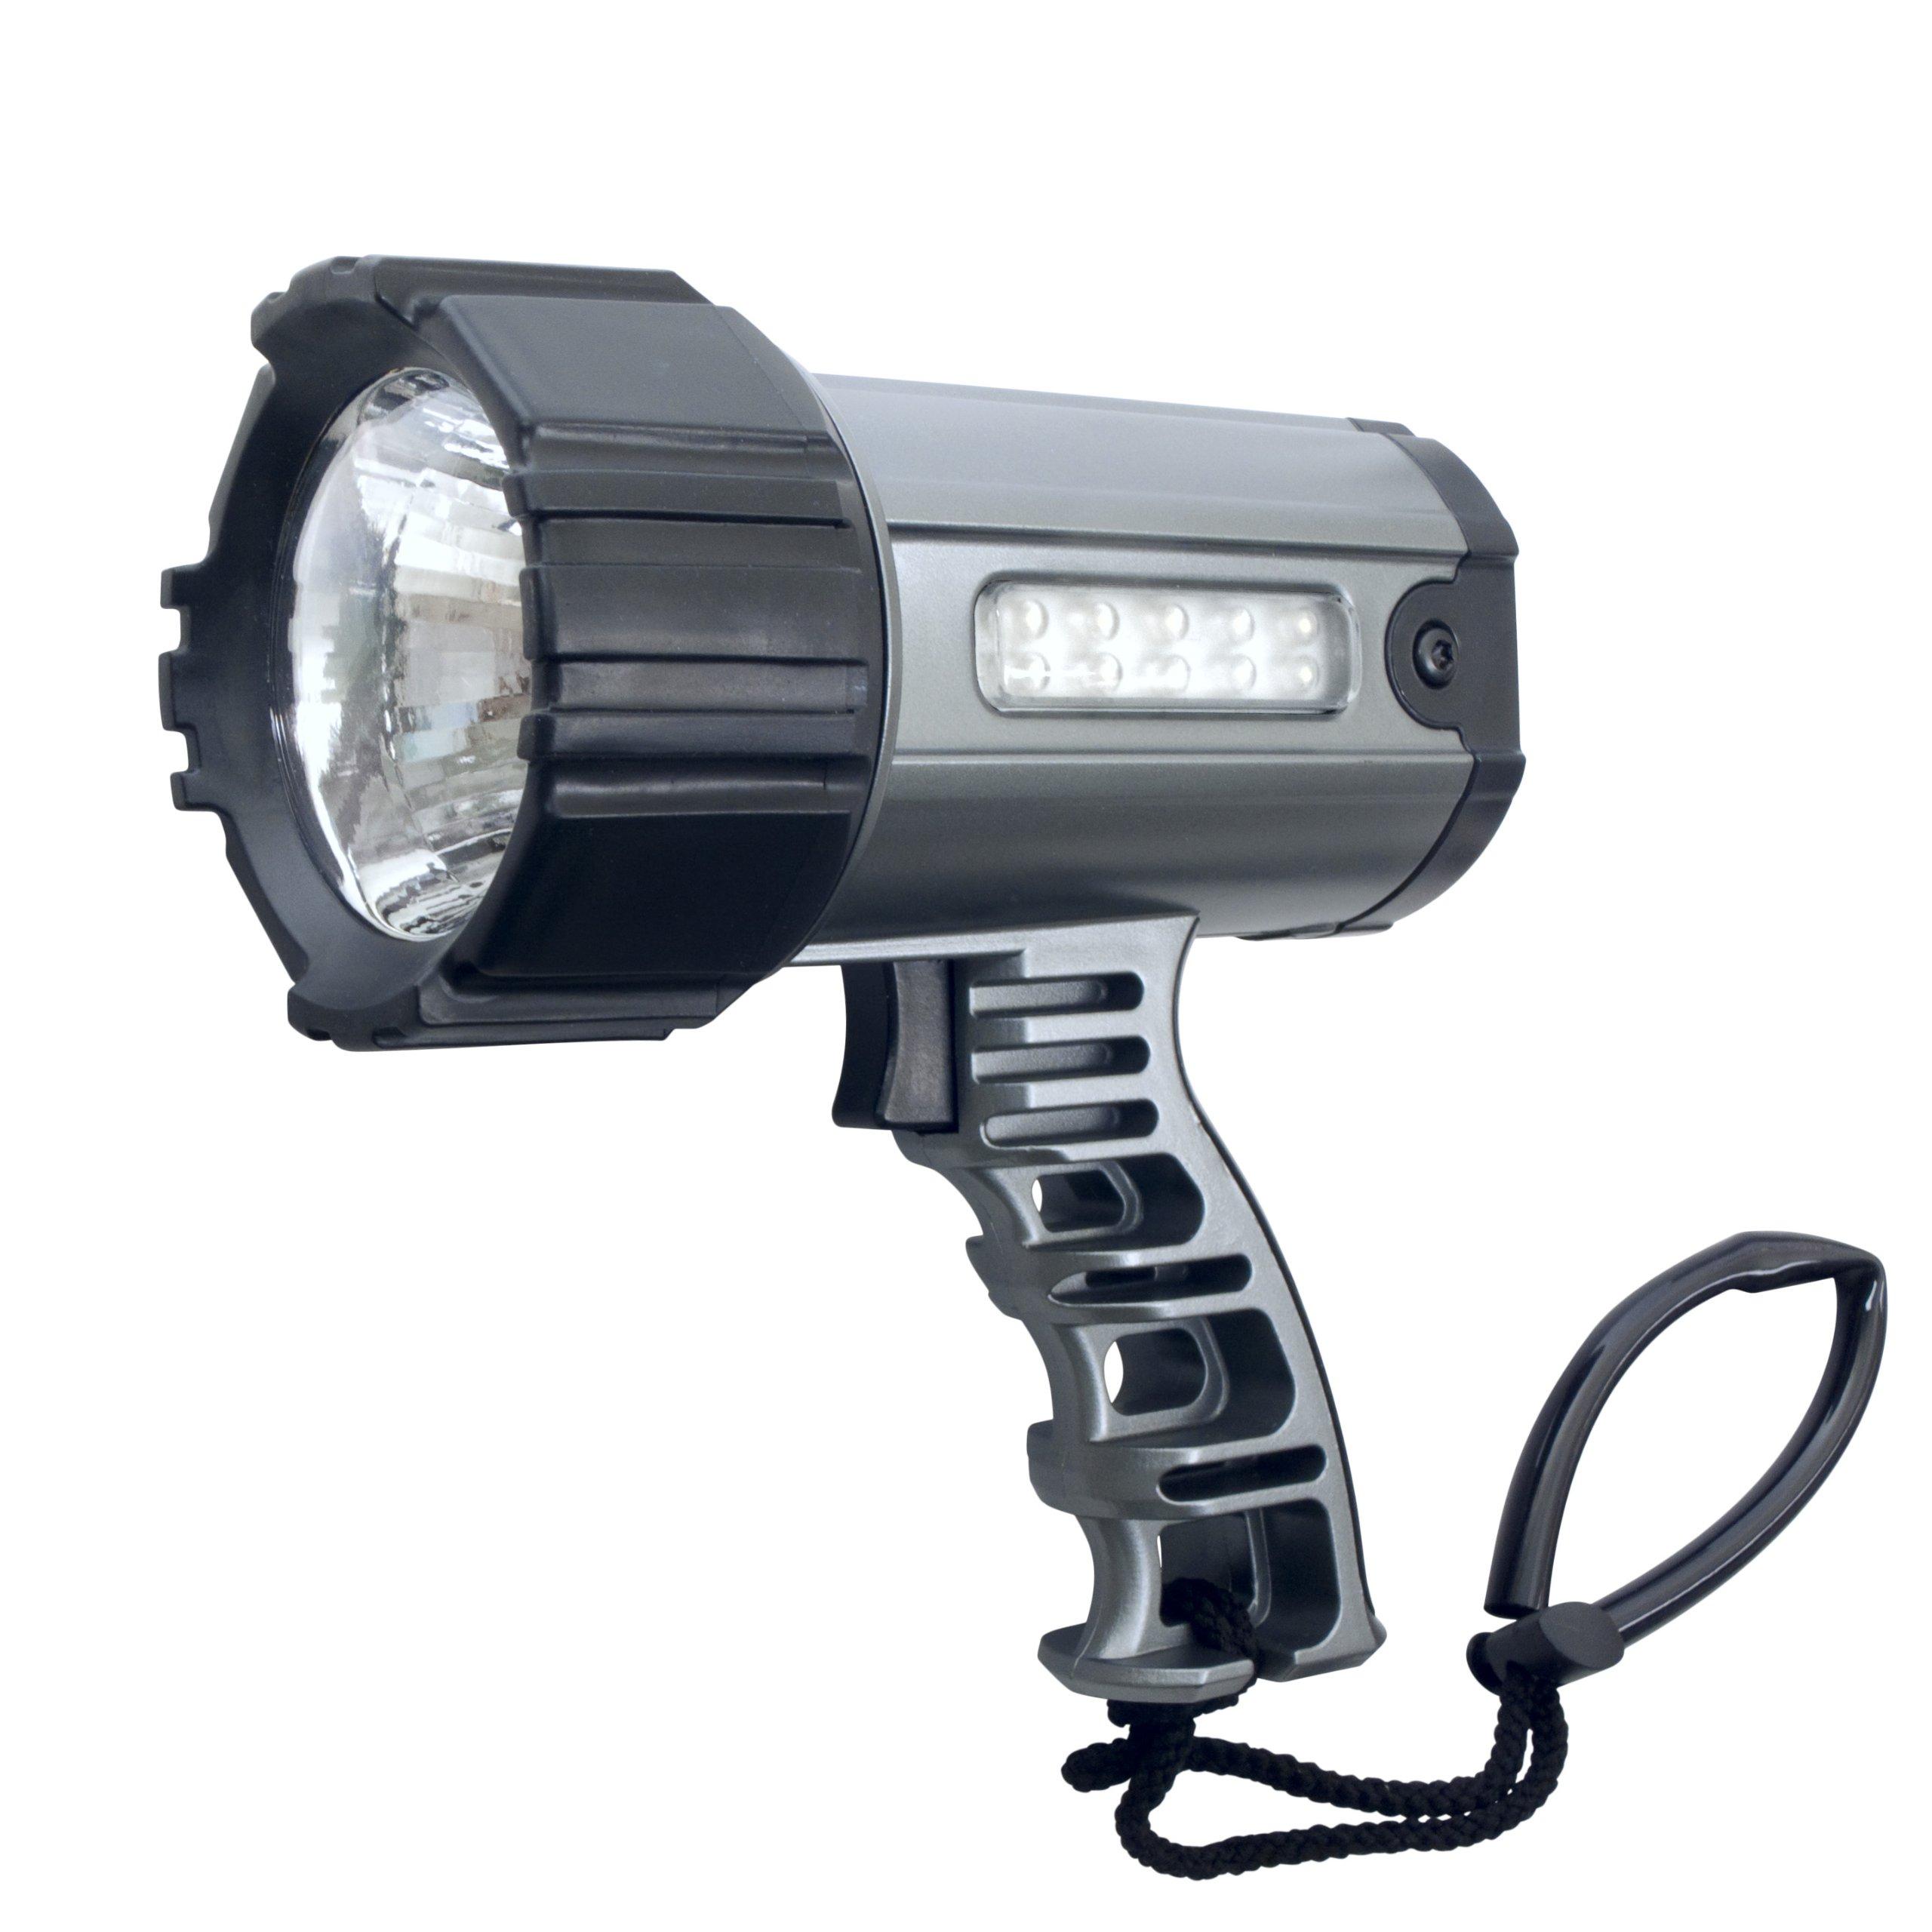 Wagan 2641 Brite-Nite 3W LED Spotlight Lantern